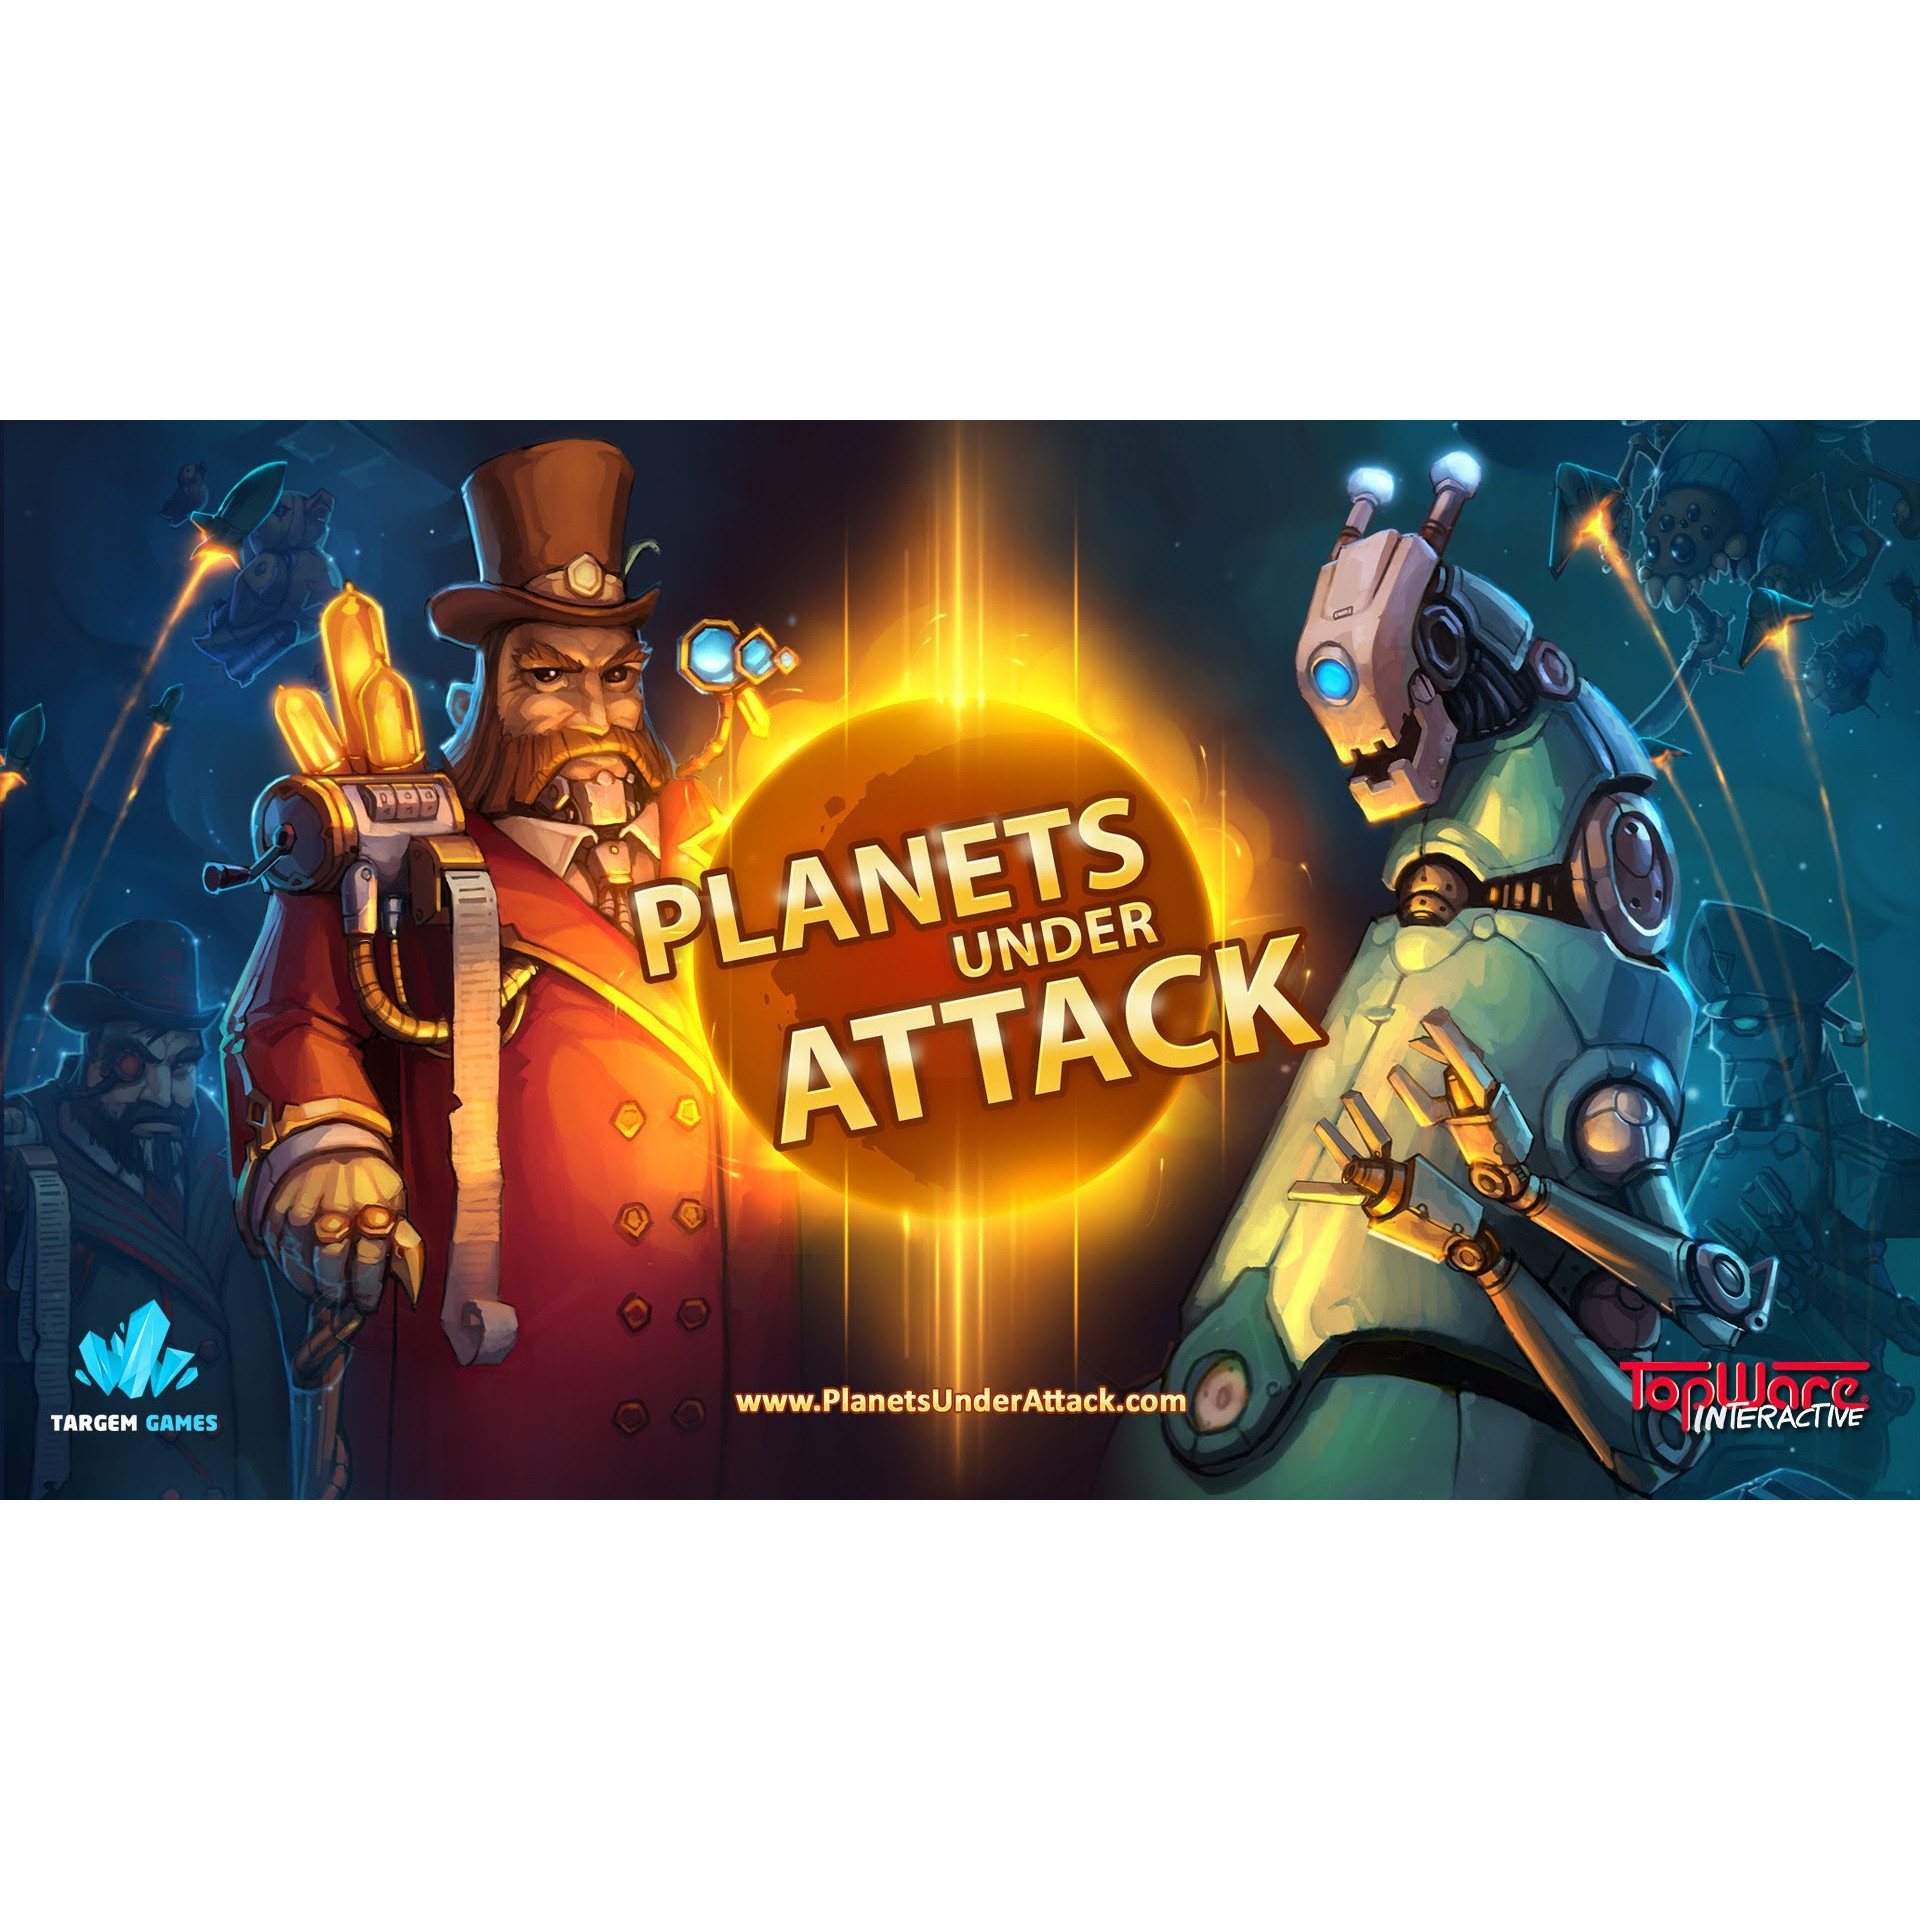 Joc Planets Under Attack Steam Pentru Calculator 4